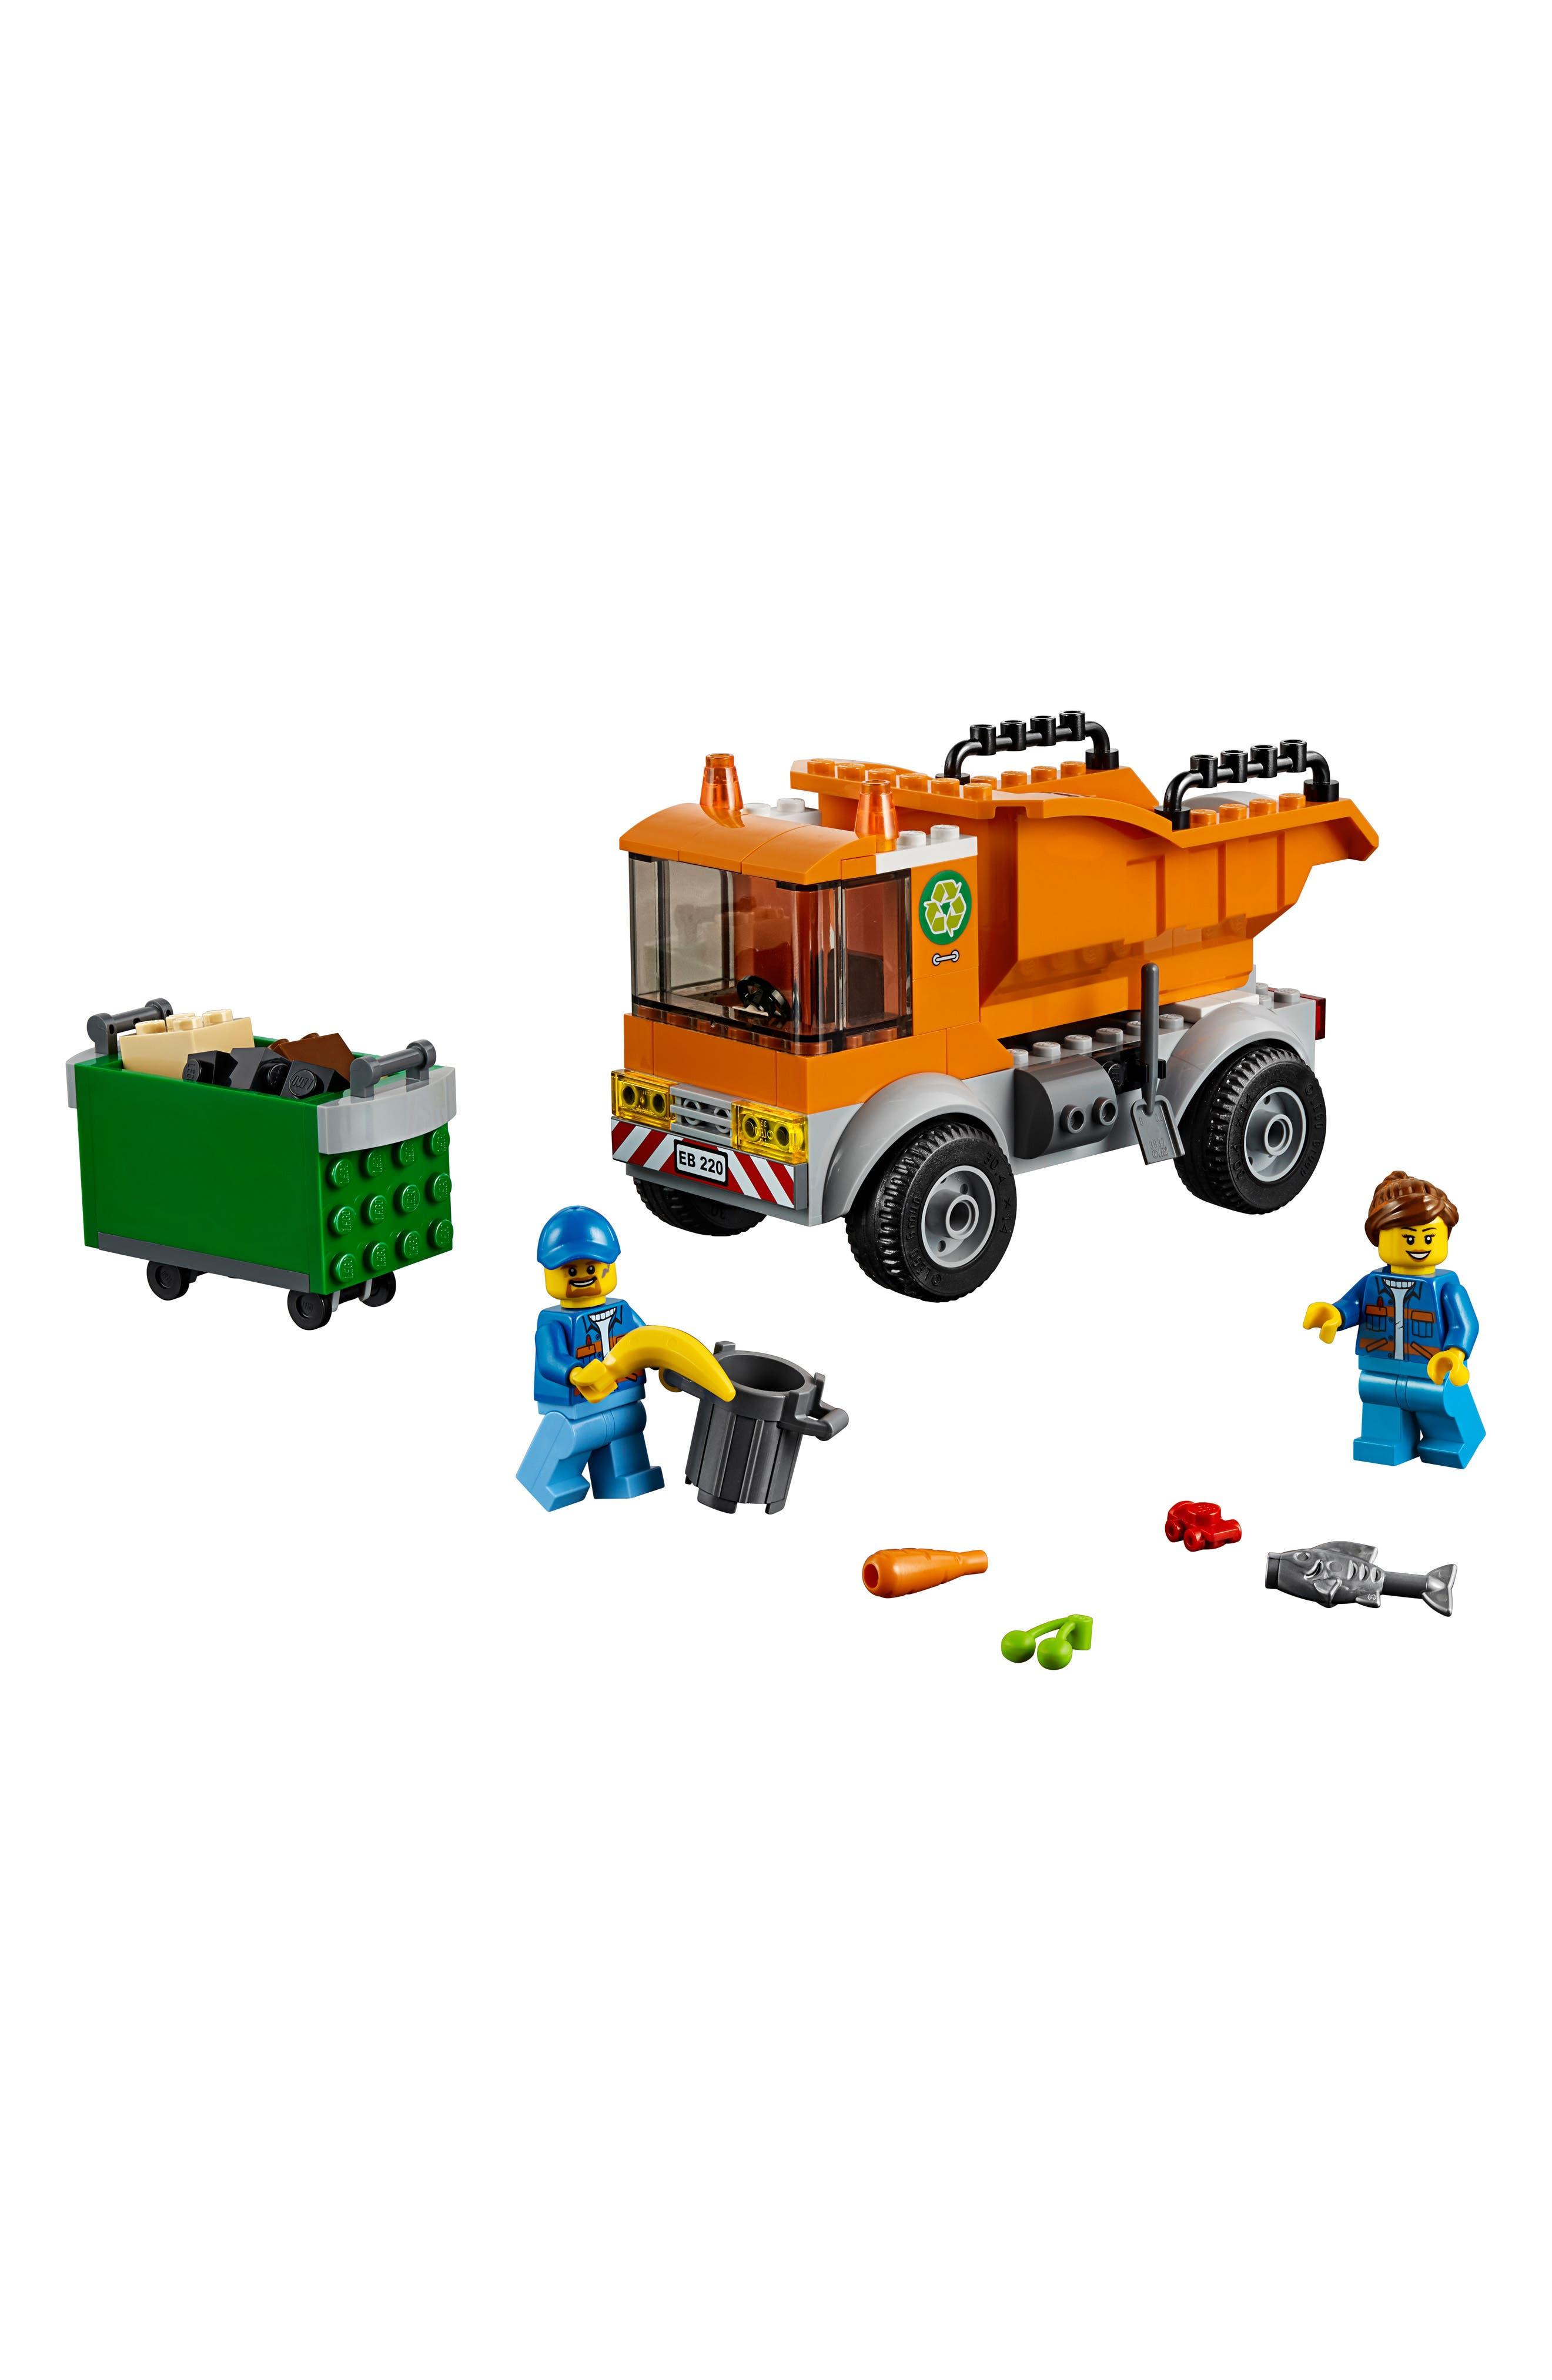 4+ City Garbage Truck - 60220, Main, color, MULTI